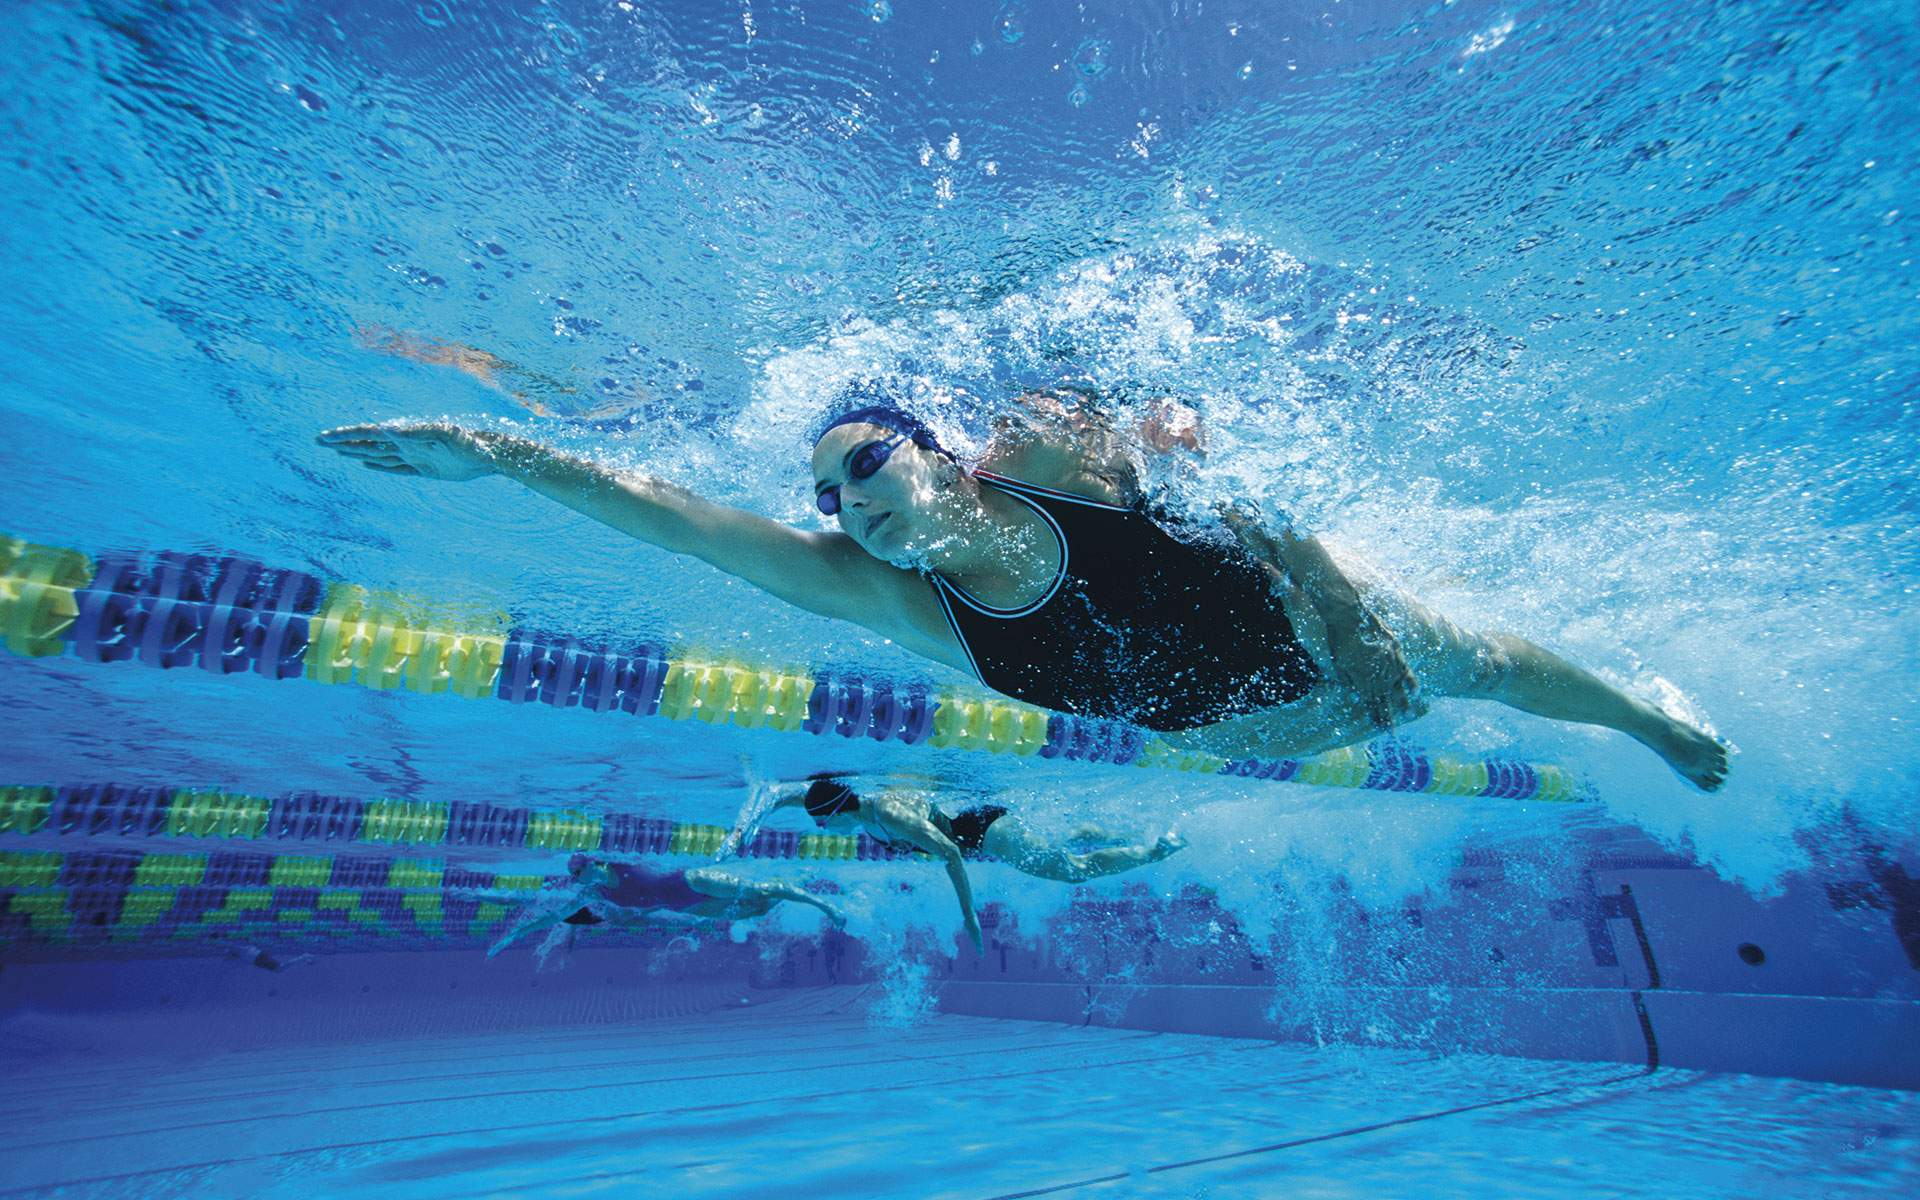 nuoto libero consigli